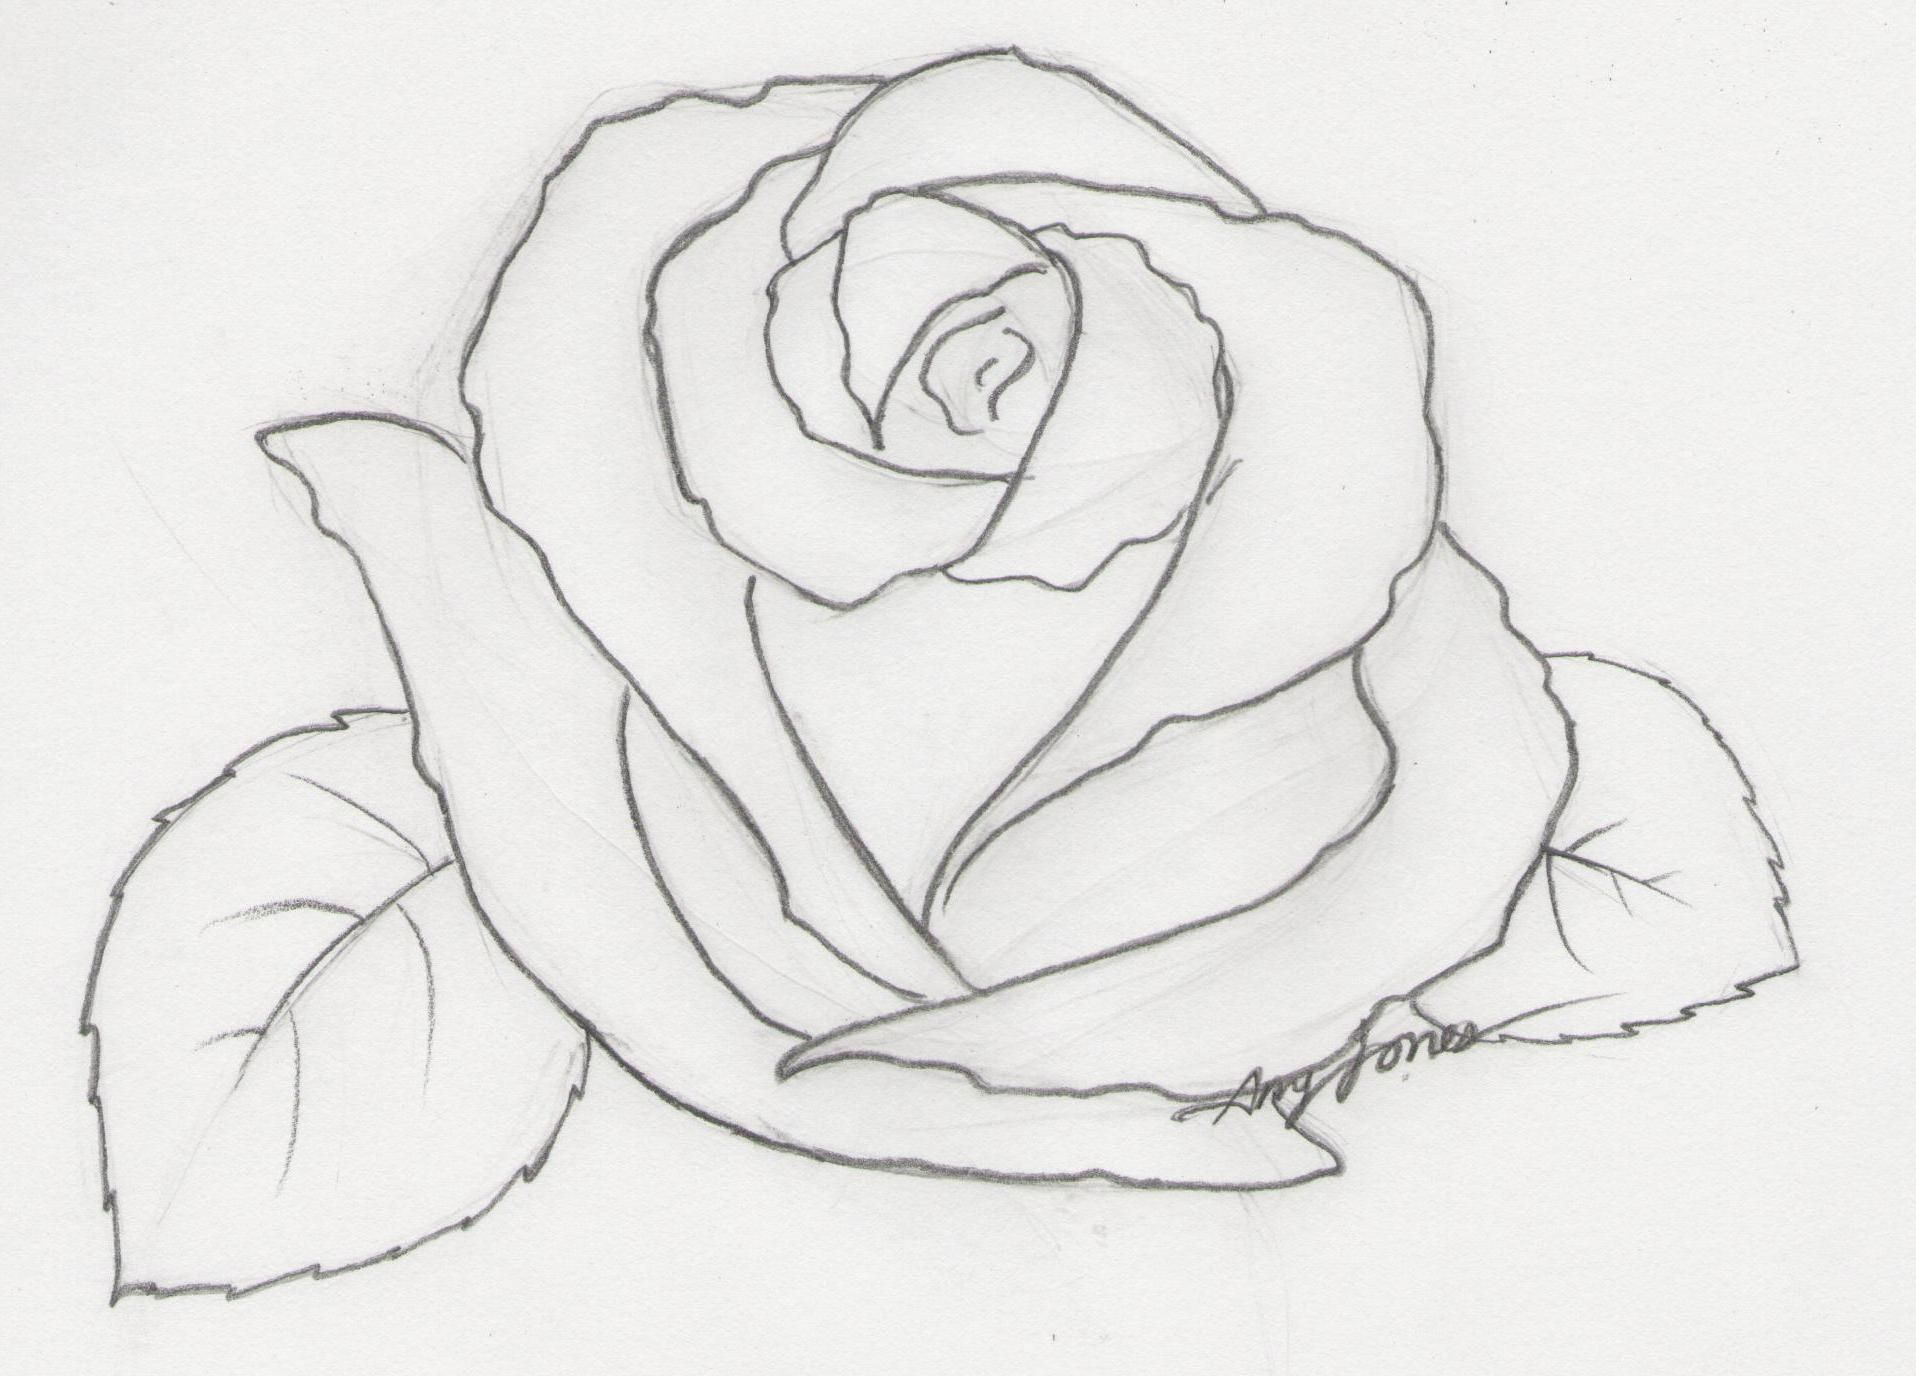 easypencildrawnflowerseasypencildrawnflowersdrawn